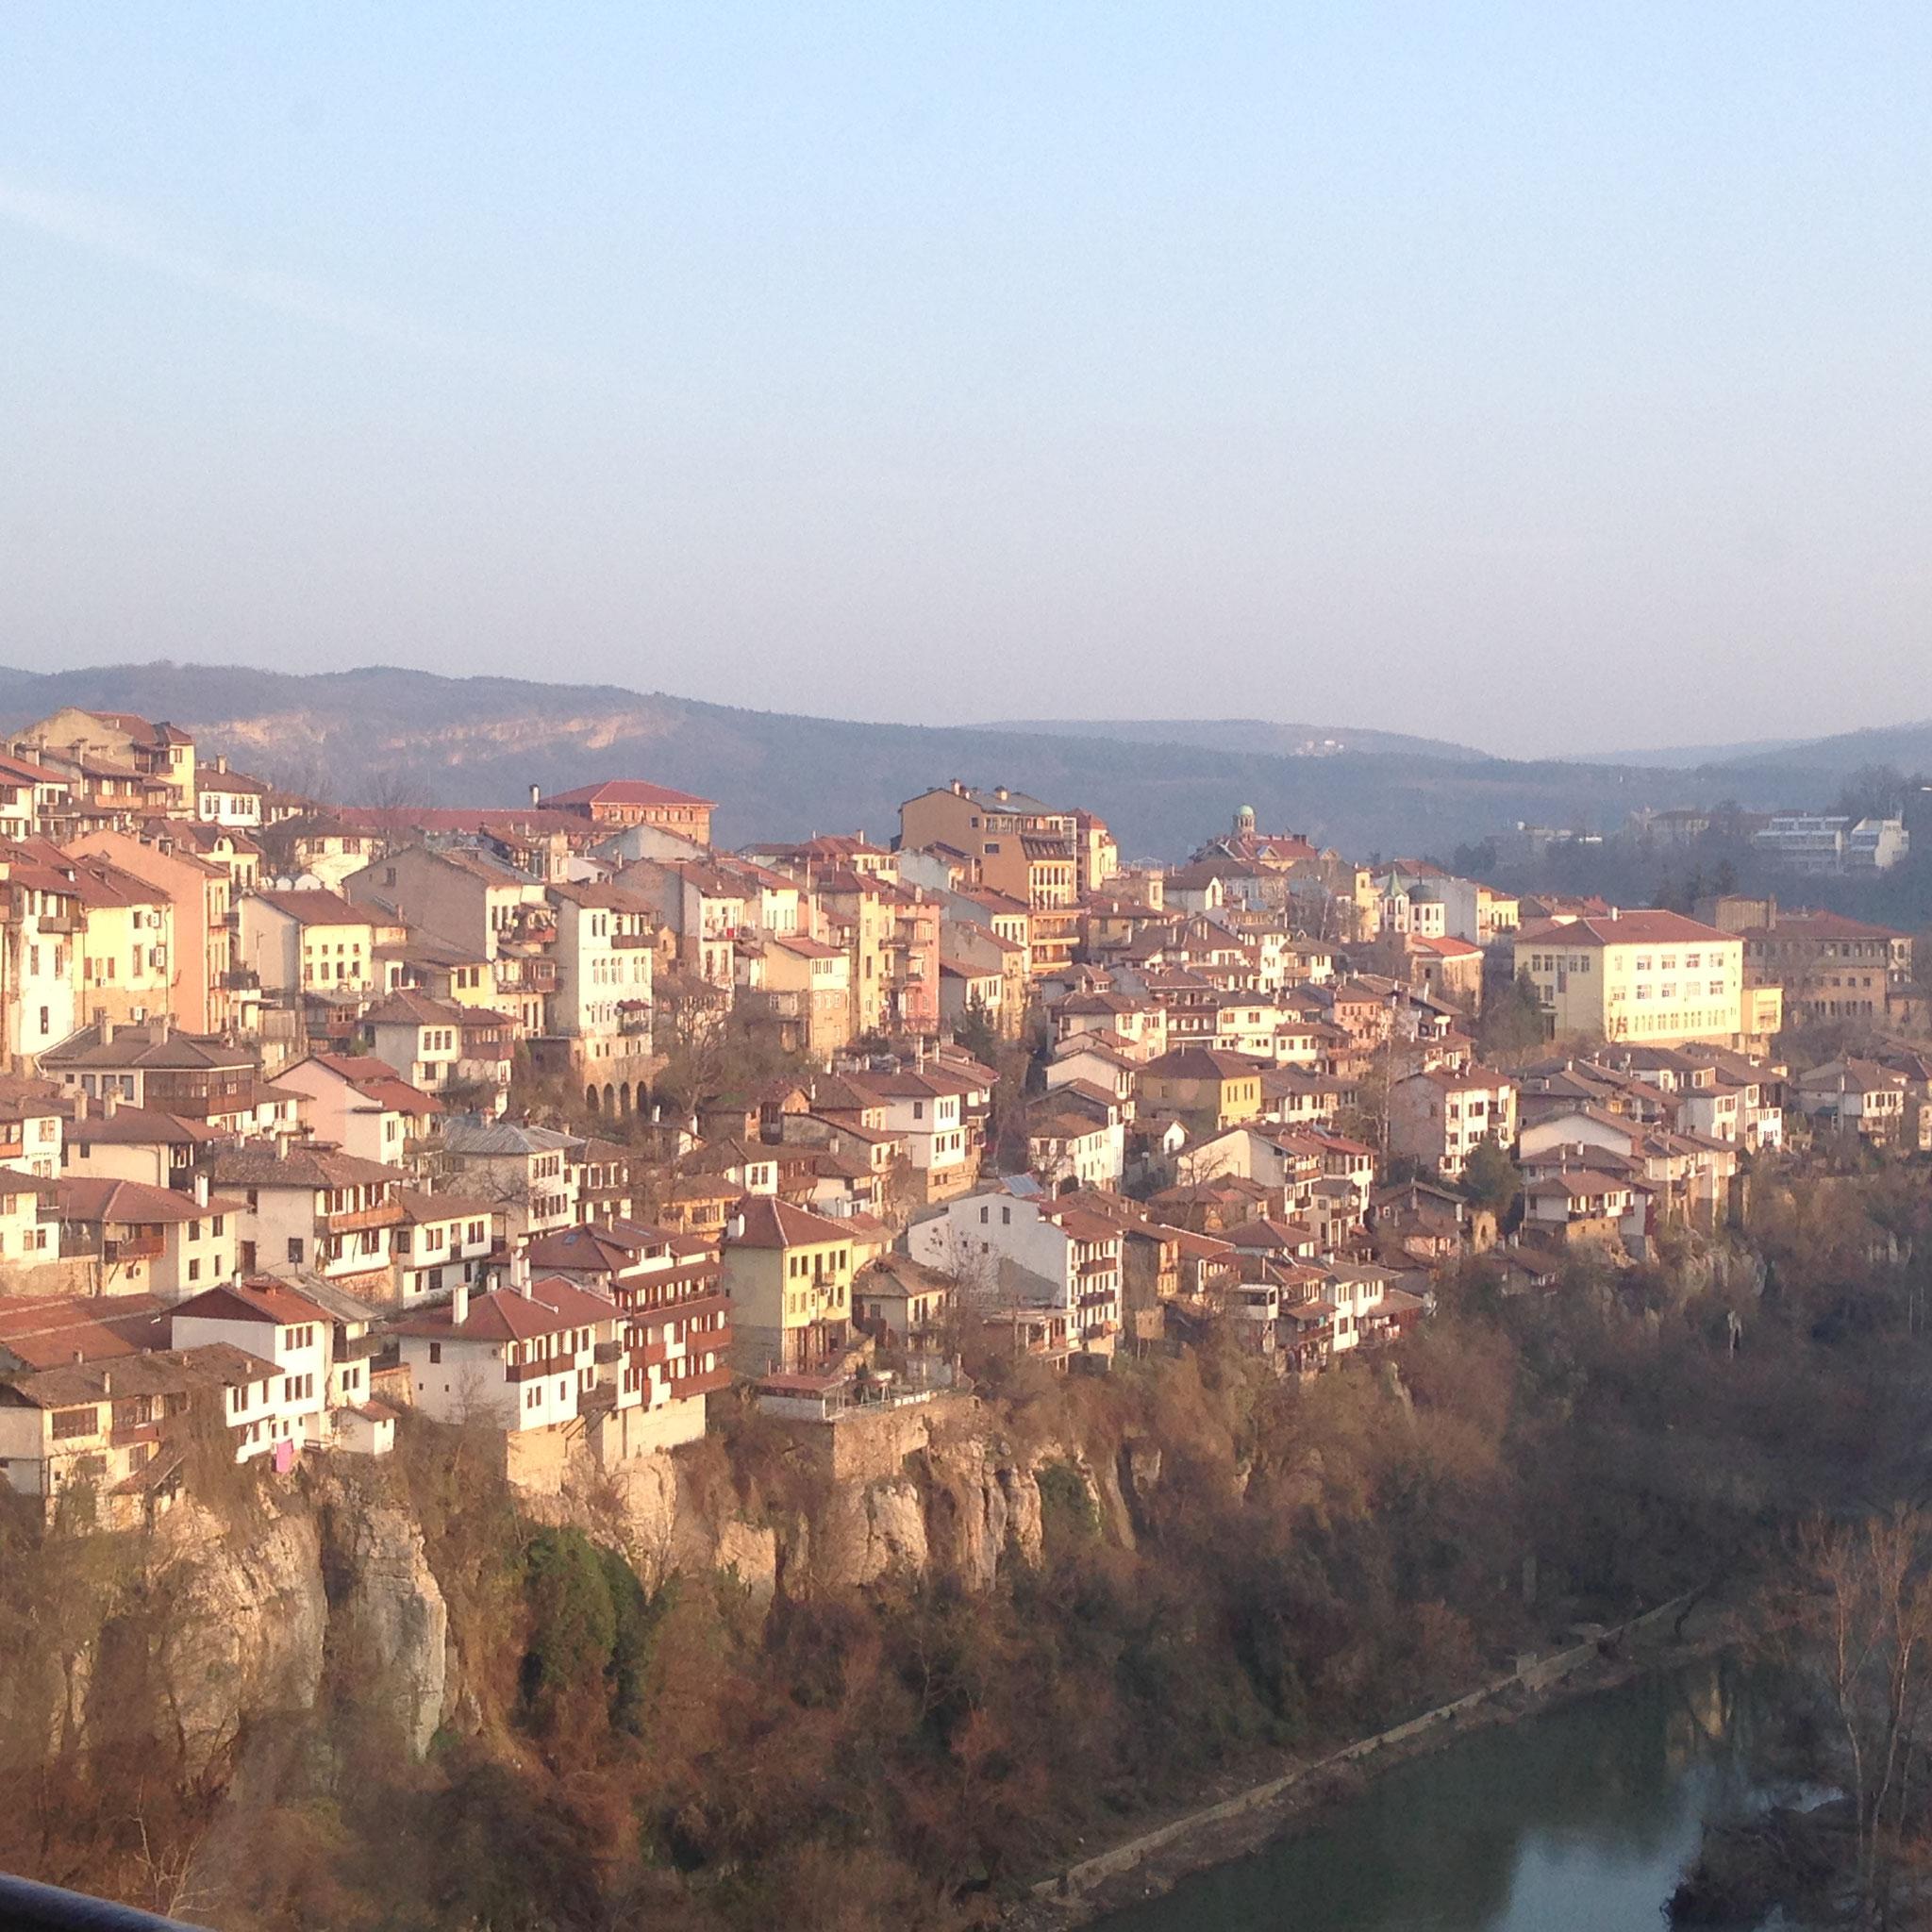 Bulgaria ヴェリコ・タルノヴォ